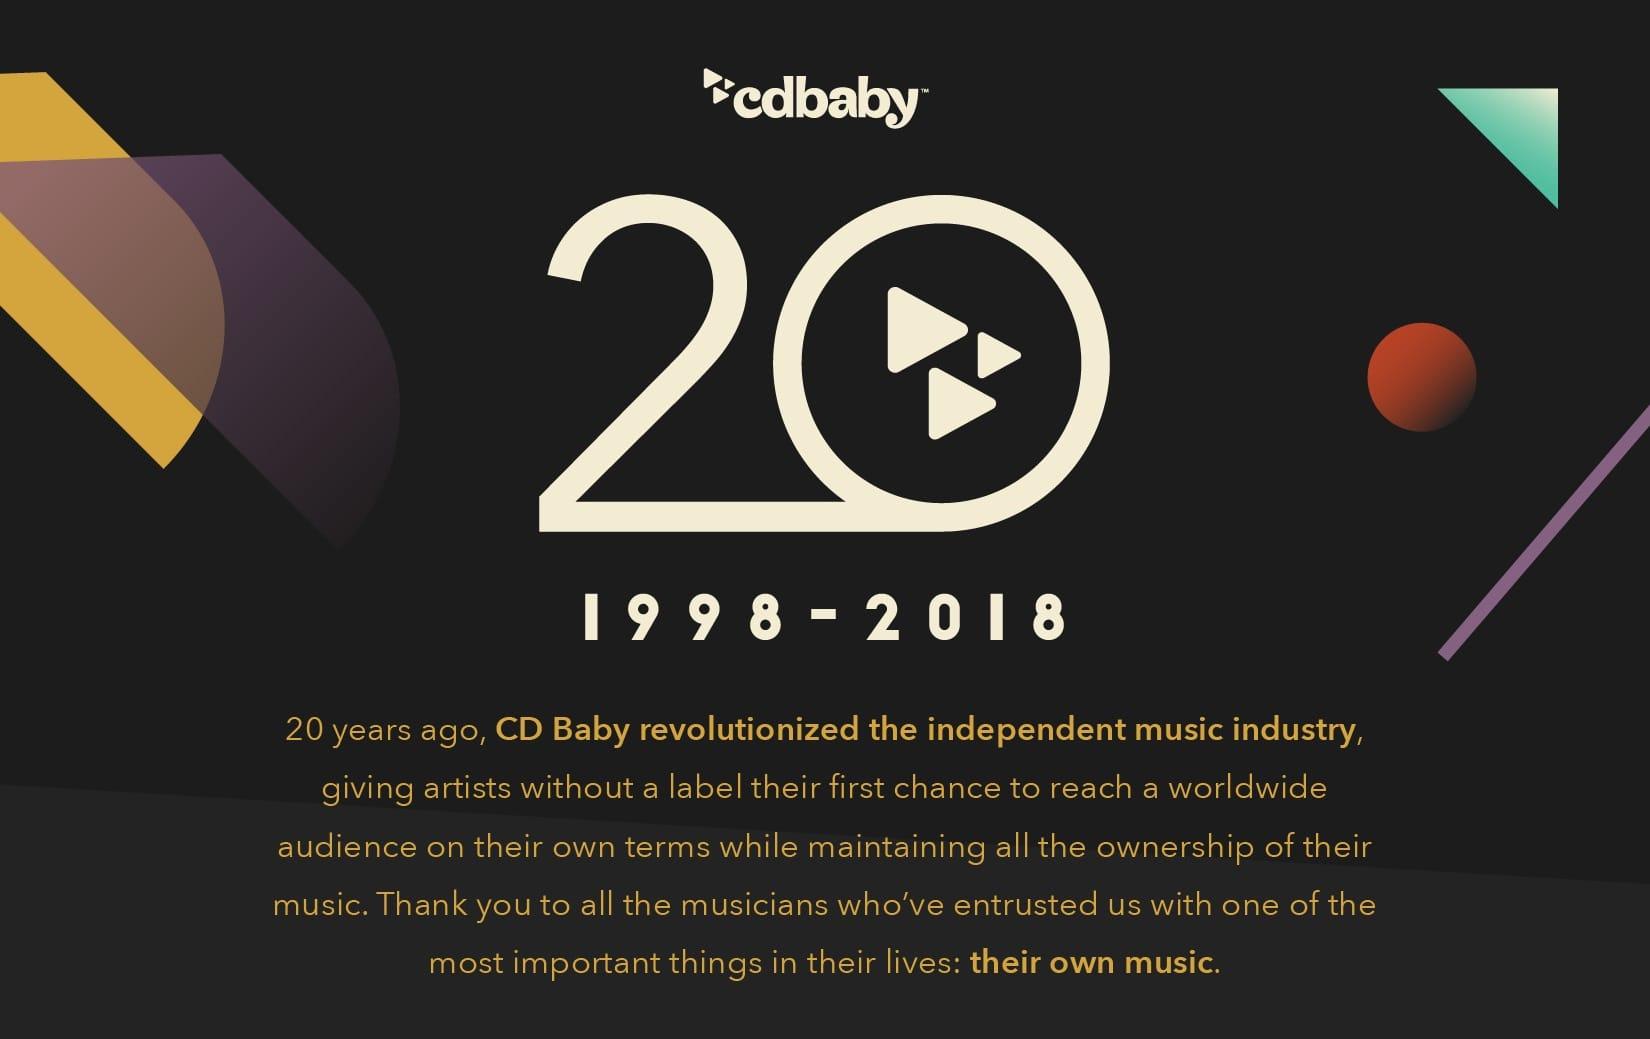 cdbb-20th-anniversary.jpg